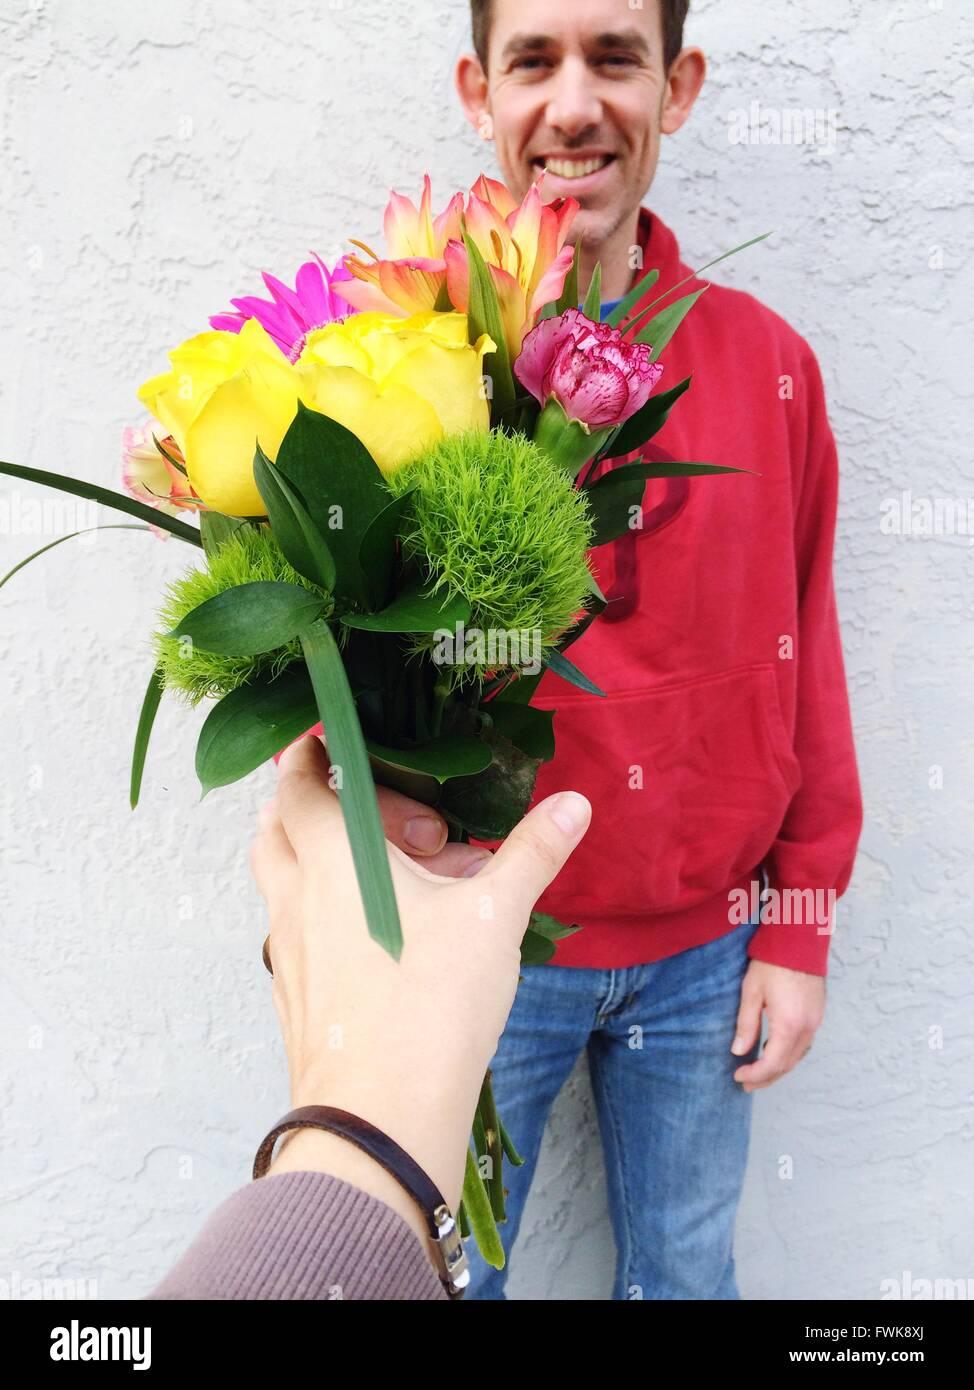 Zugeschnittenes Bild Frau Freund gegen Wand Bouquet erhalten Stockbild